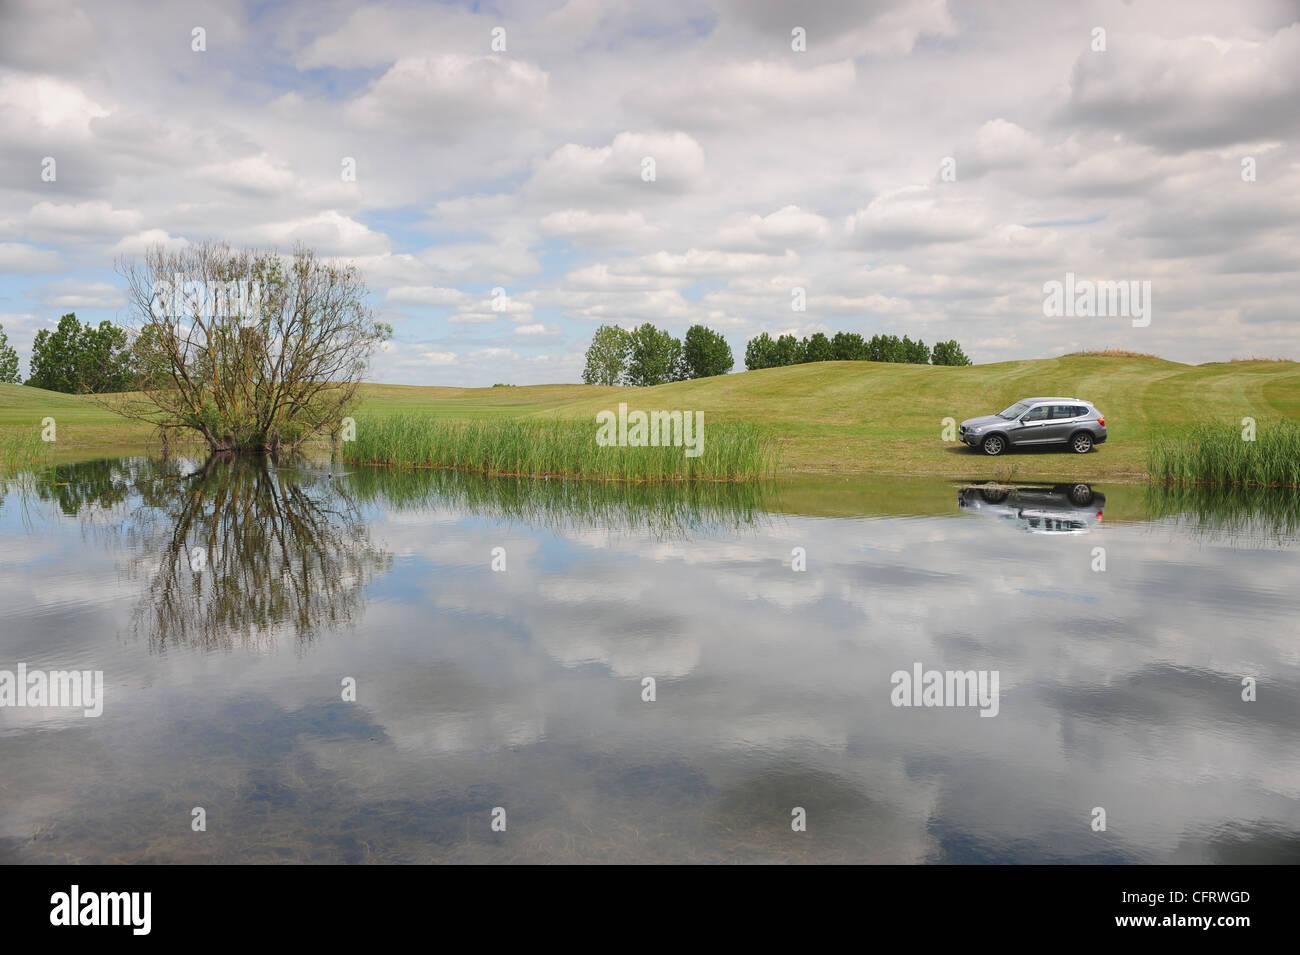 off road adventure - Stock Image